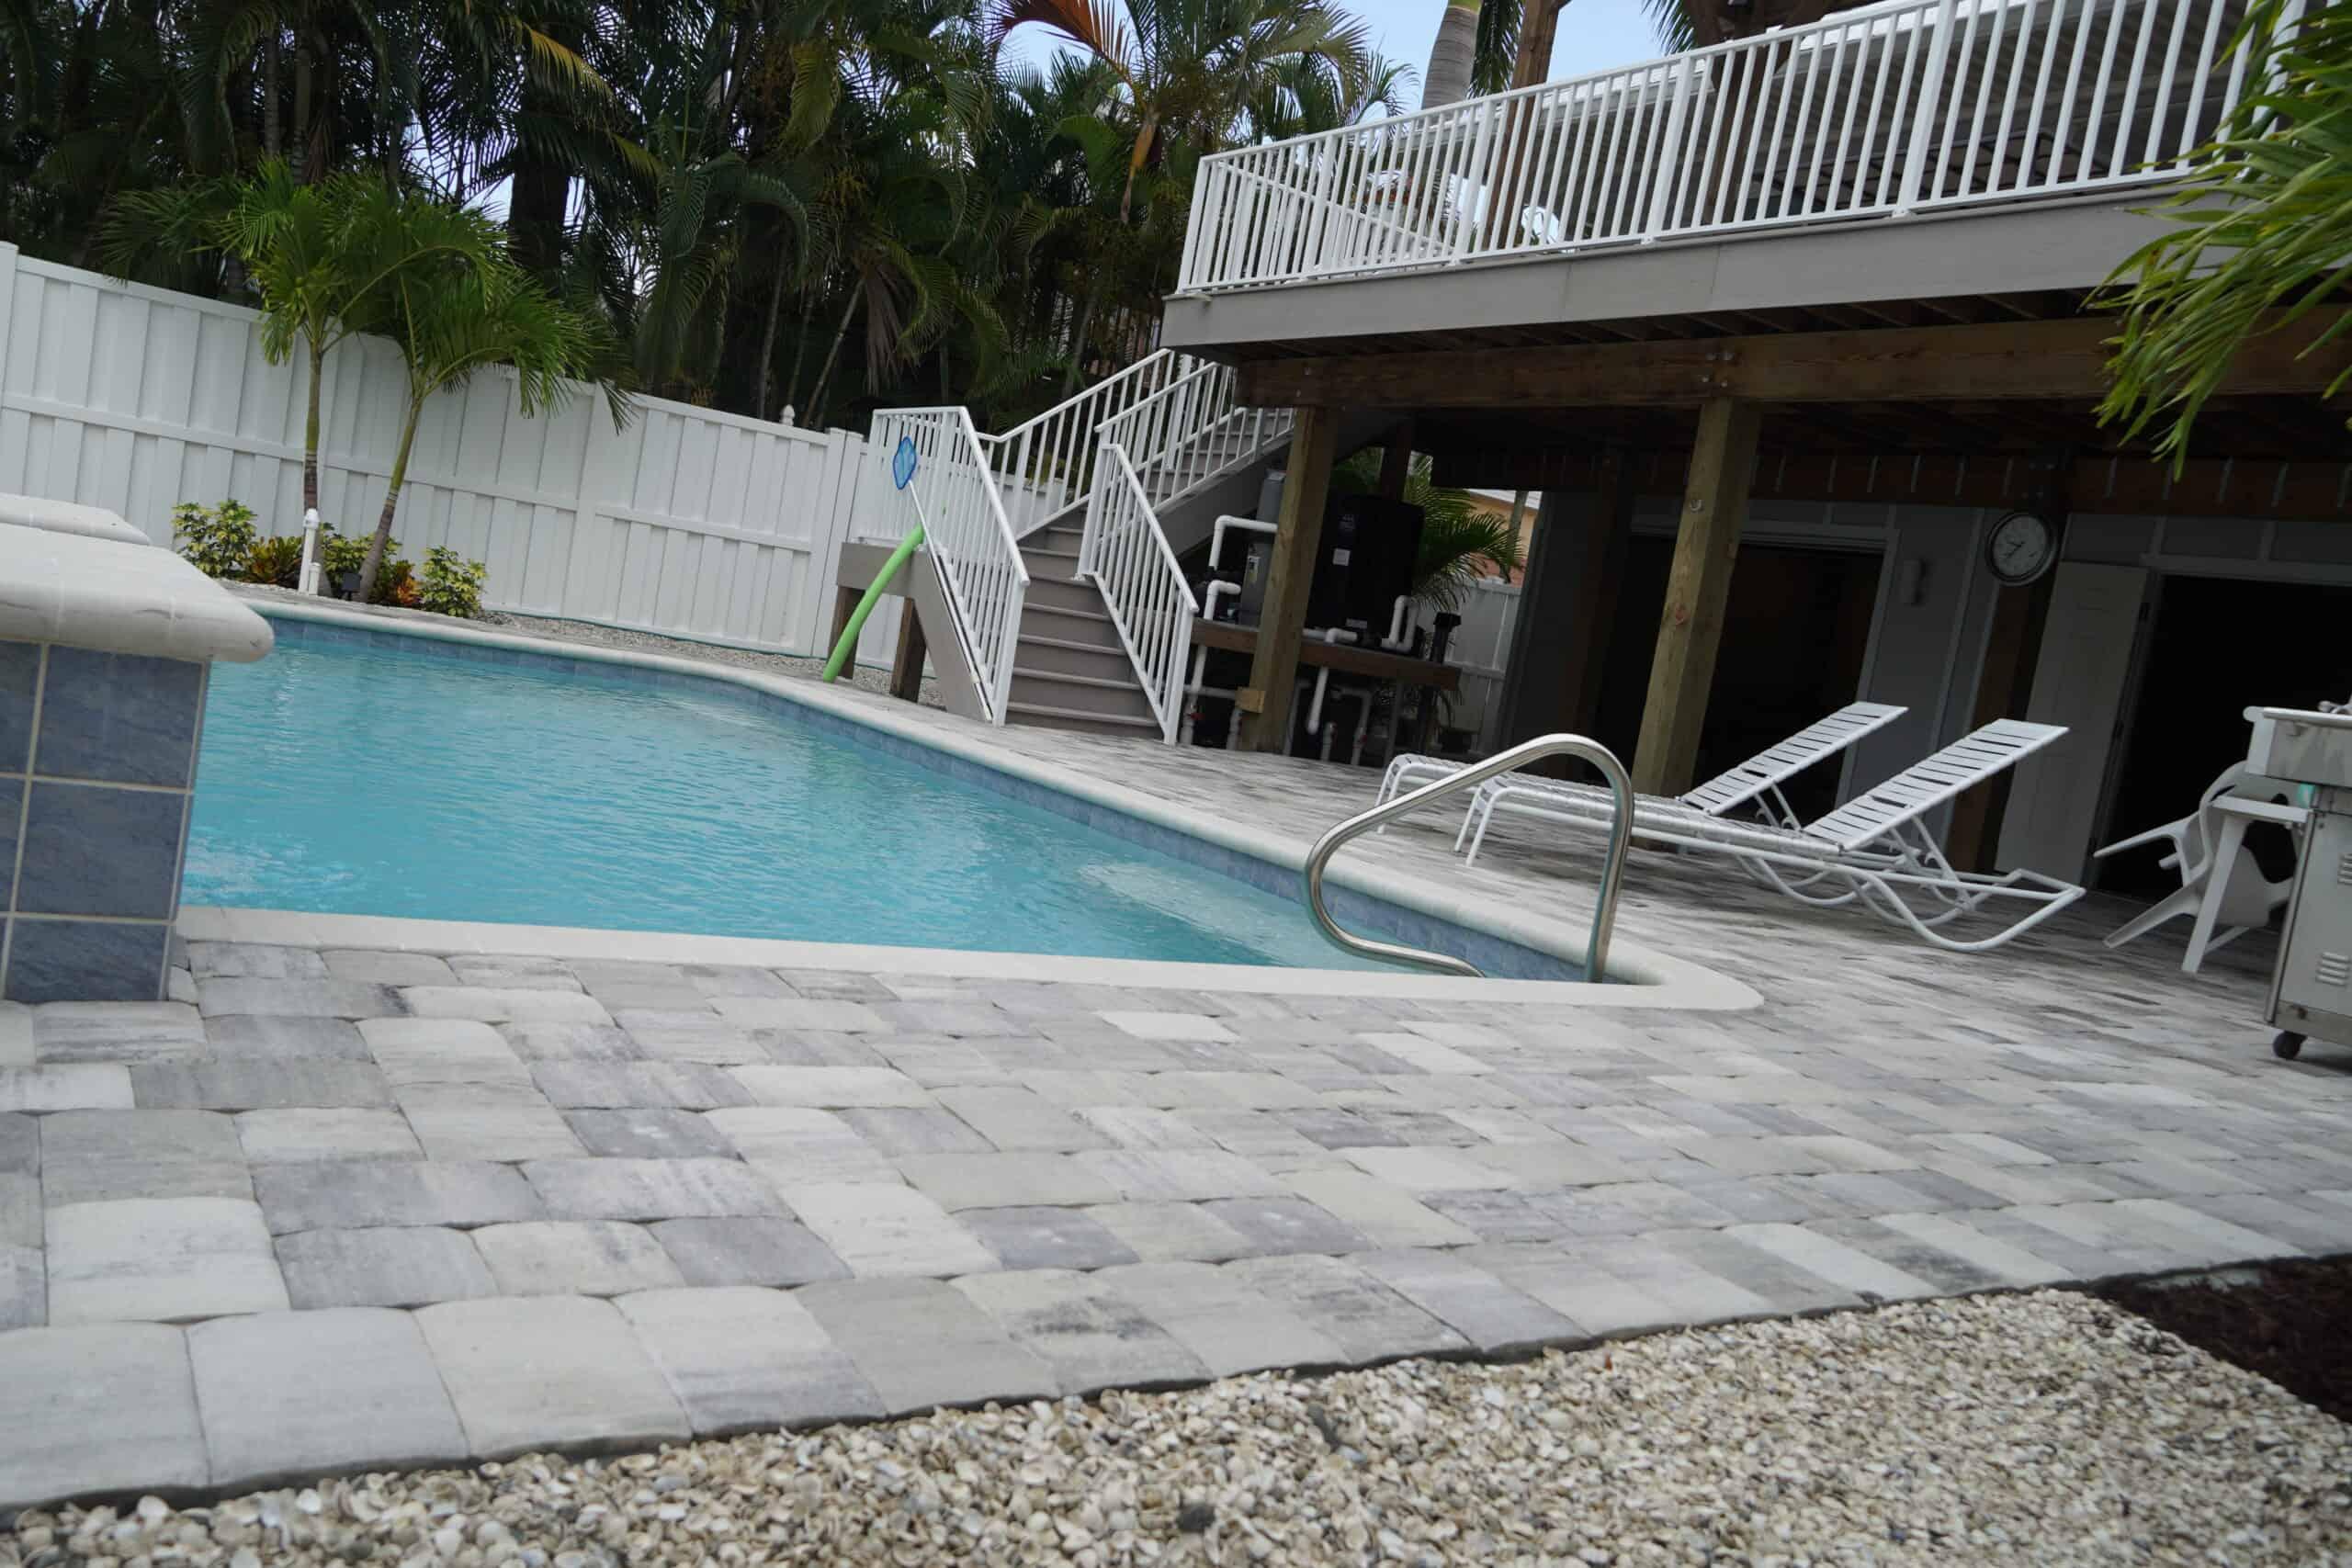 Naples Pool Patio Paver Installation A